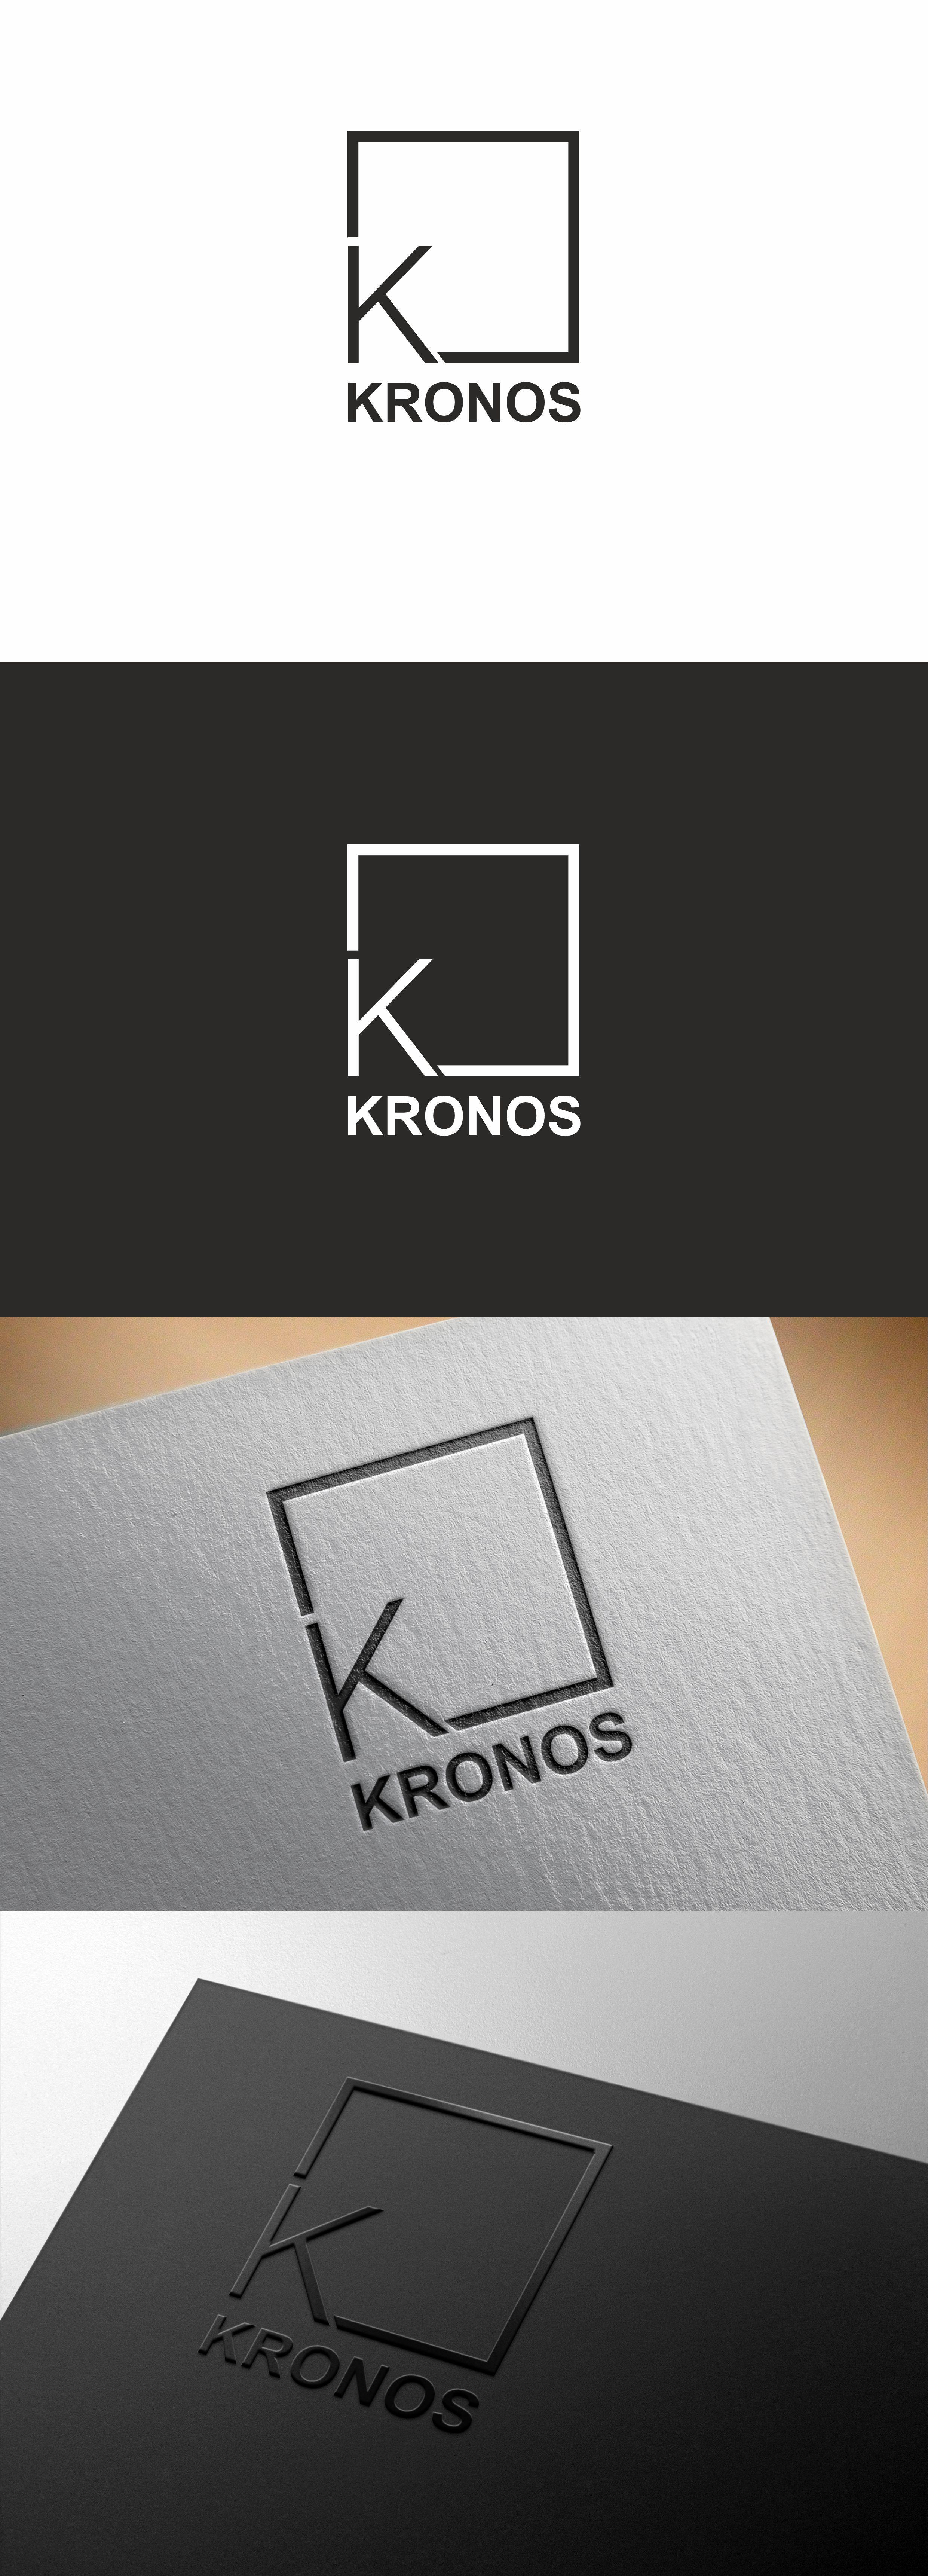 Разработать логотип KRONOS фото f_4395fb0280a219a8.jpg